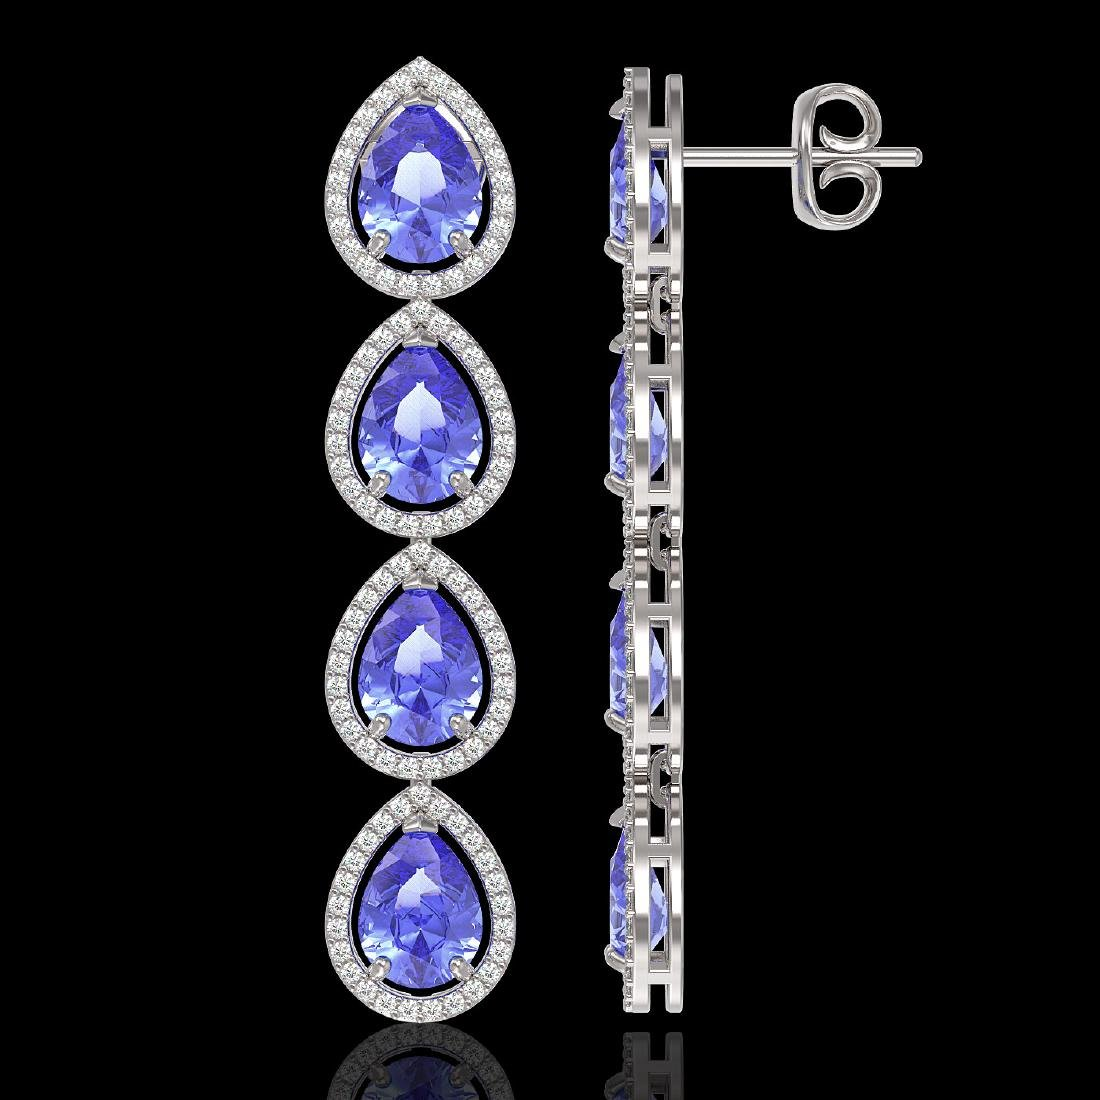 11.2 CTW Tanzanite & Diamond Halo Earrings 10K White - 2